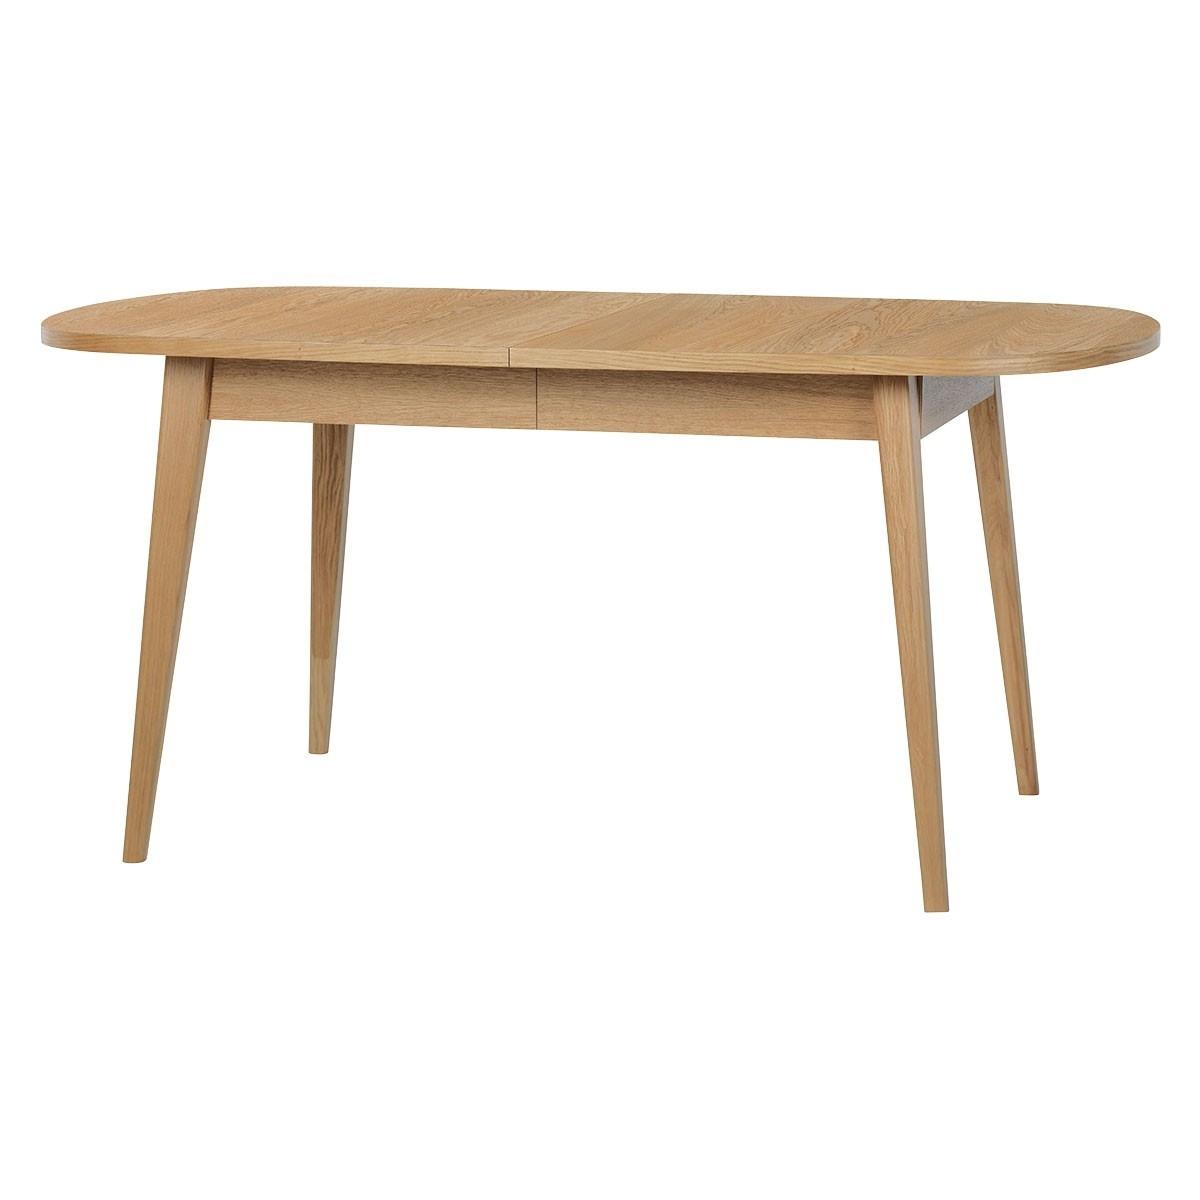 Preferred Etta 6 8 Seater Oak Extending Dining Table (View 20 of 25)